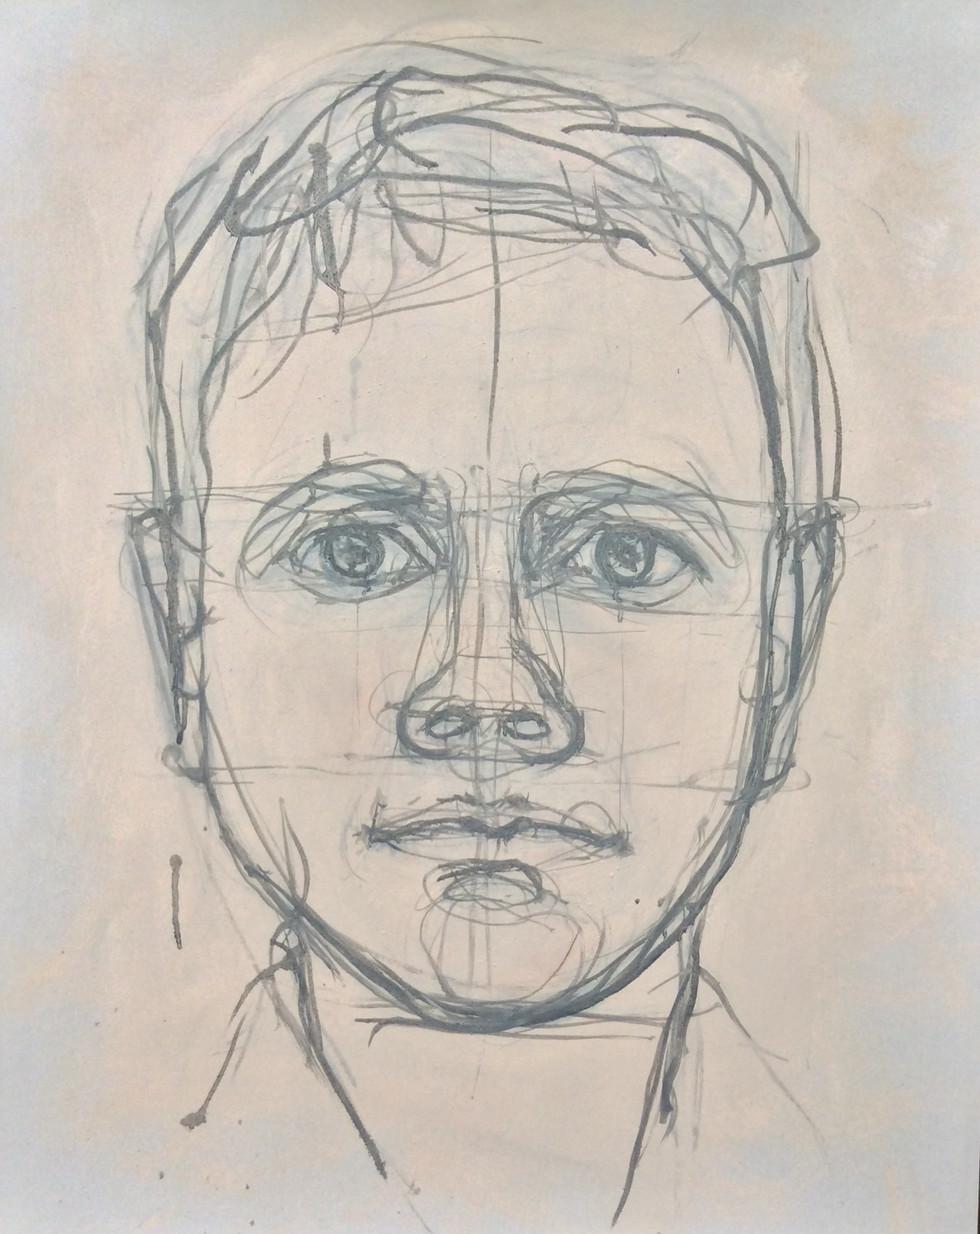 Self Portrait Staring, March 2019